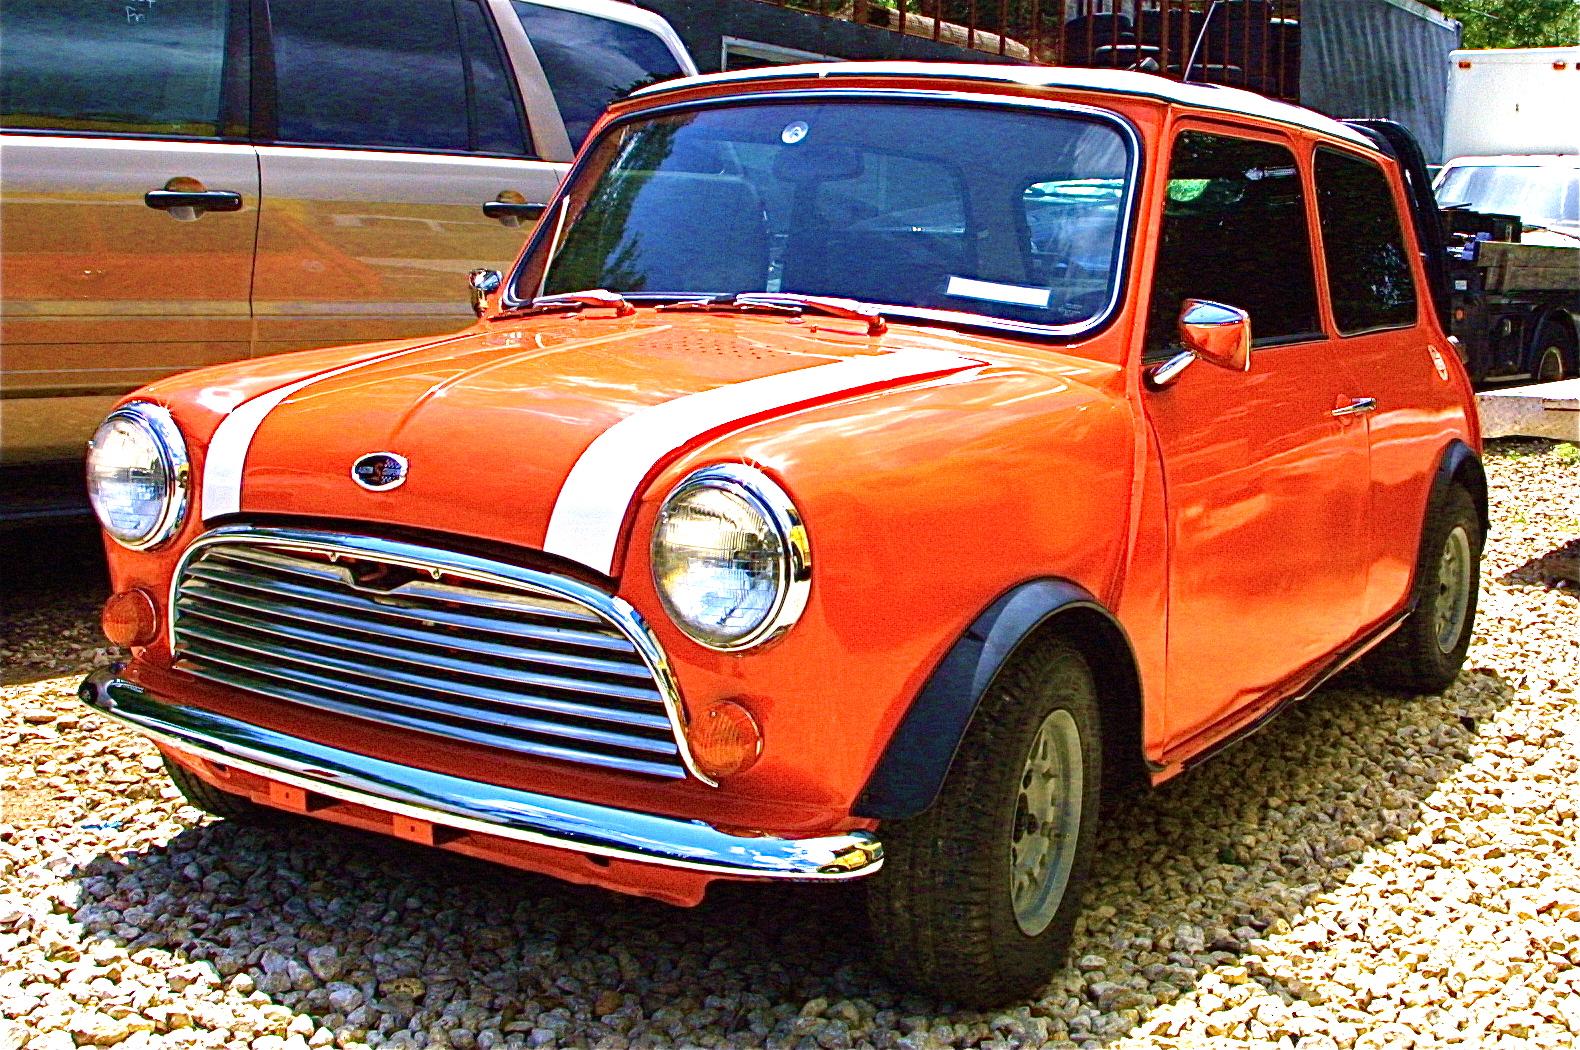 Mini cooper s for sale at motoreum in nw austin atx car for Garage austin mini